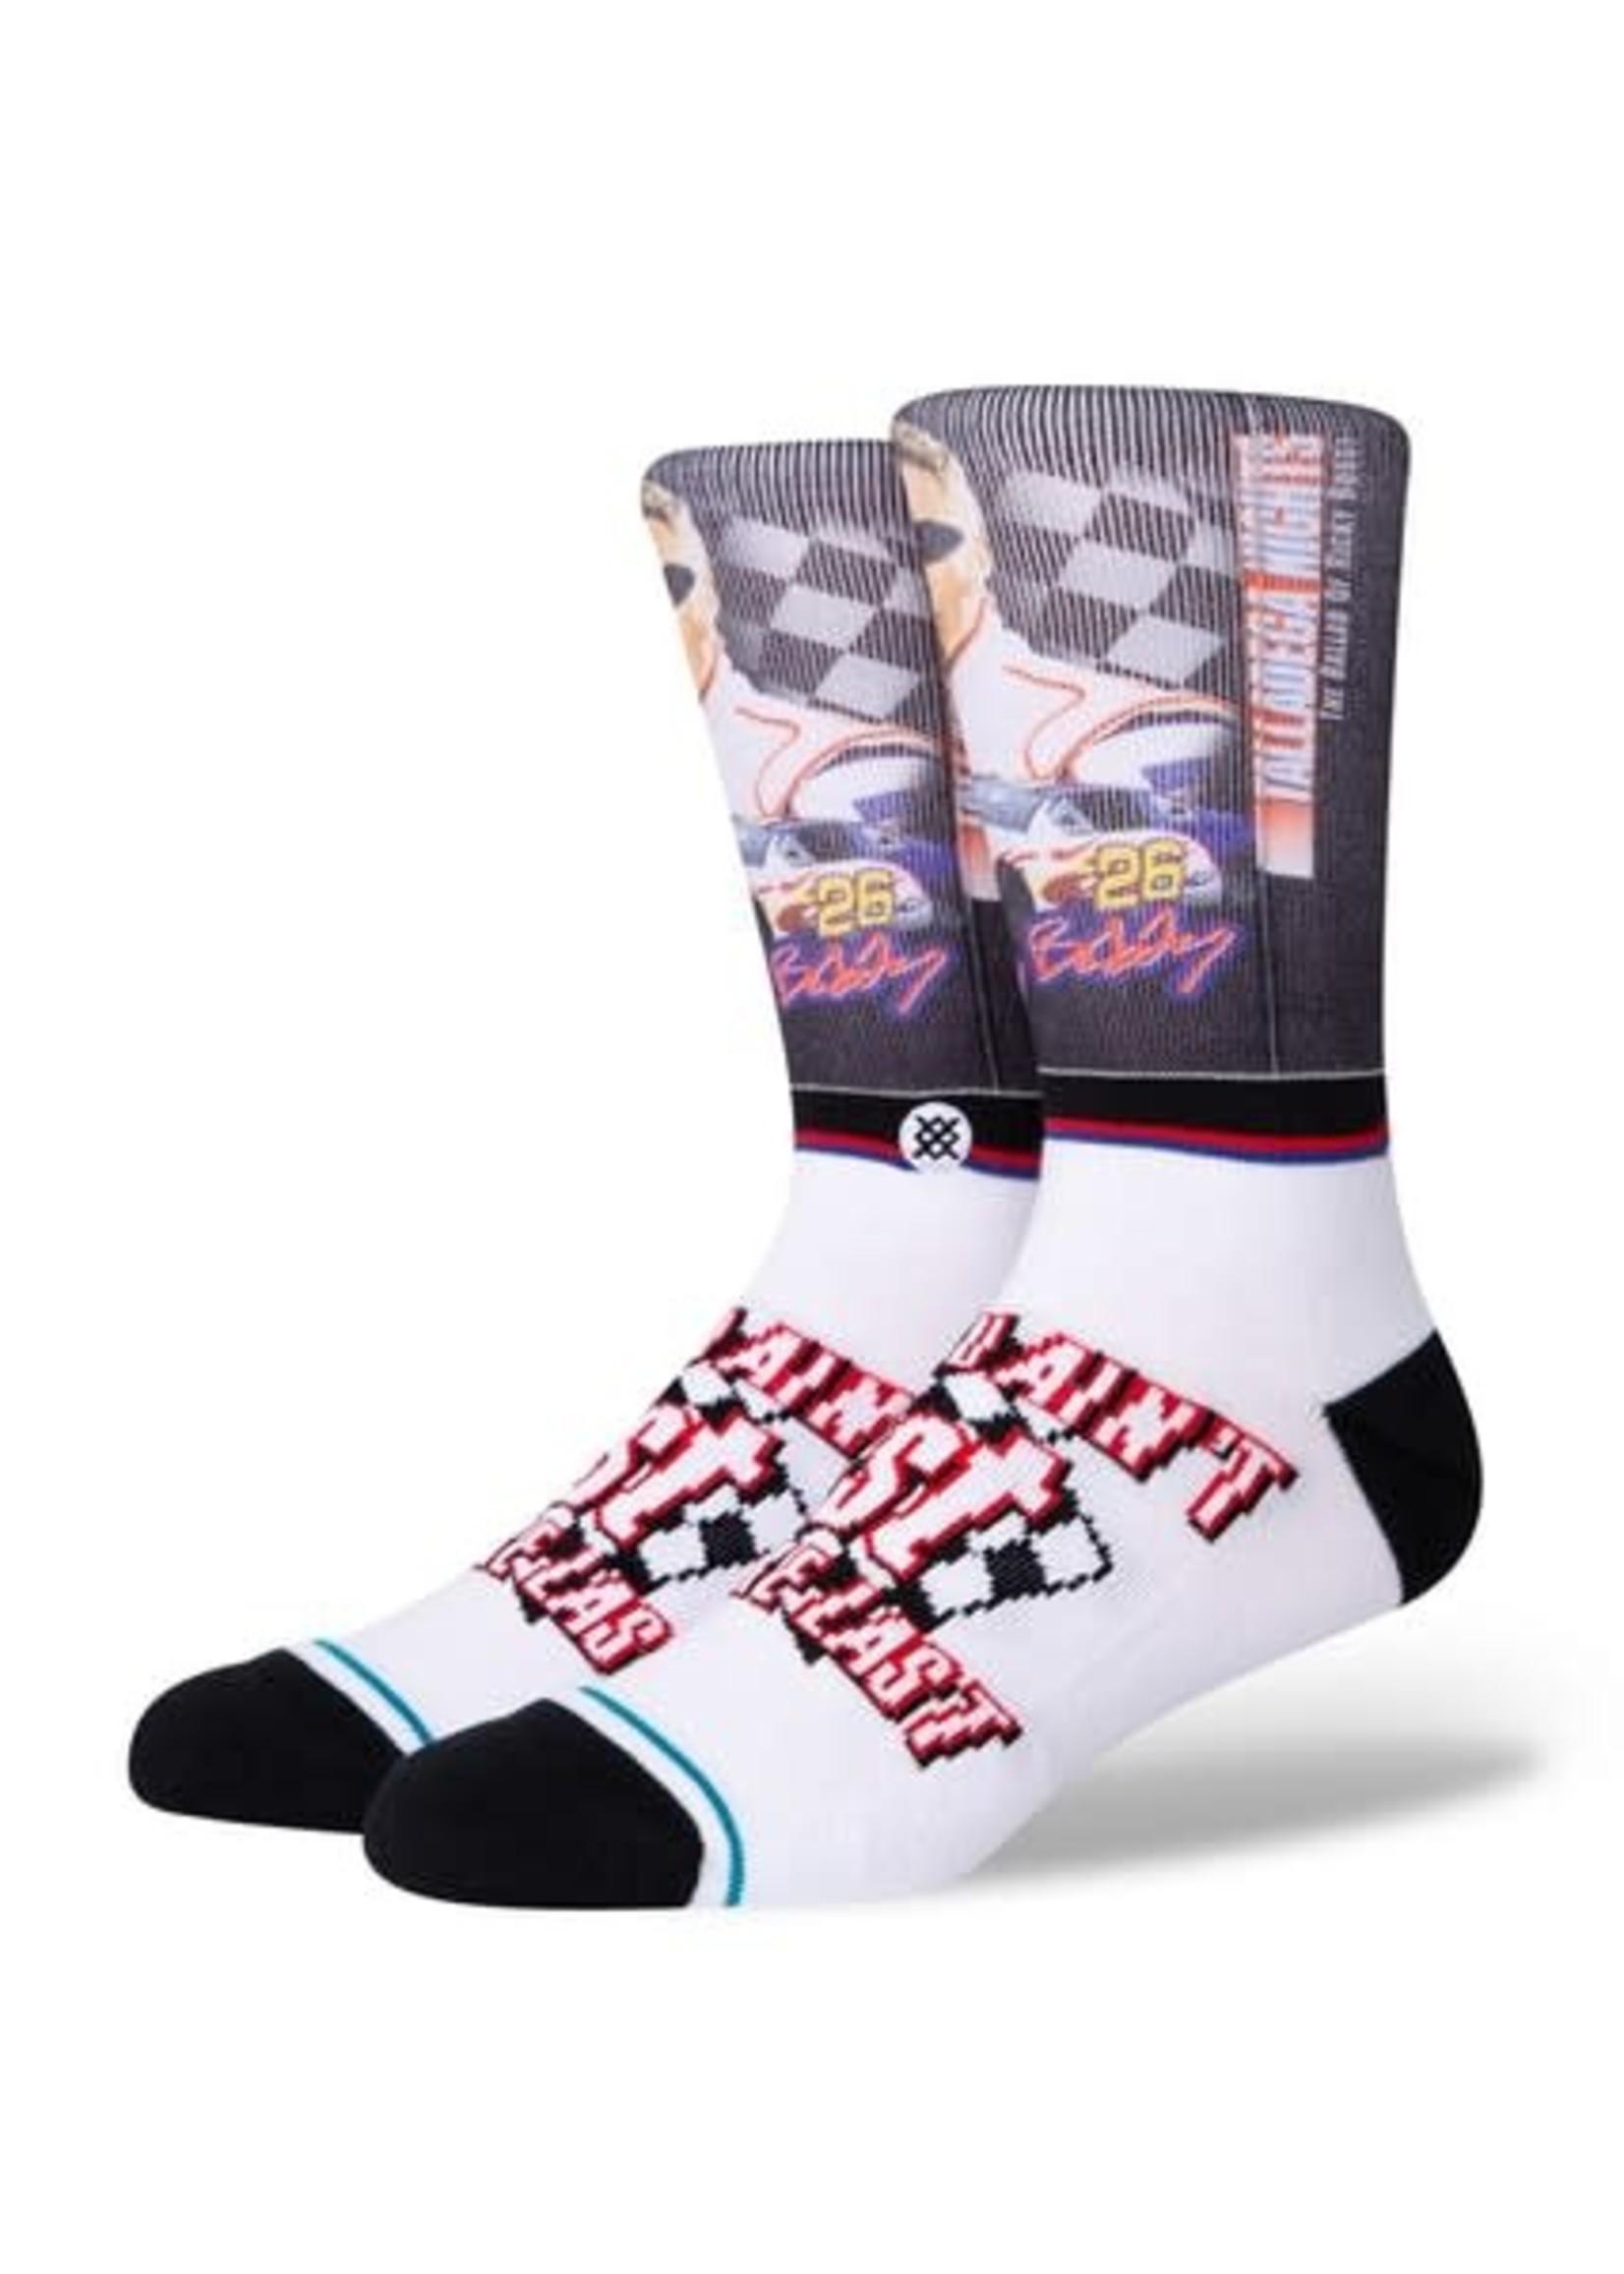 Stance Stance Talladega Nights First You're Last Socks